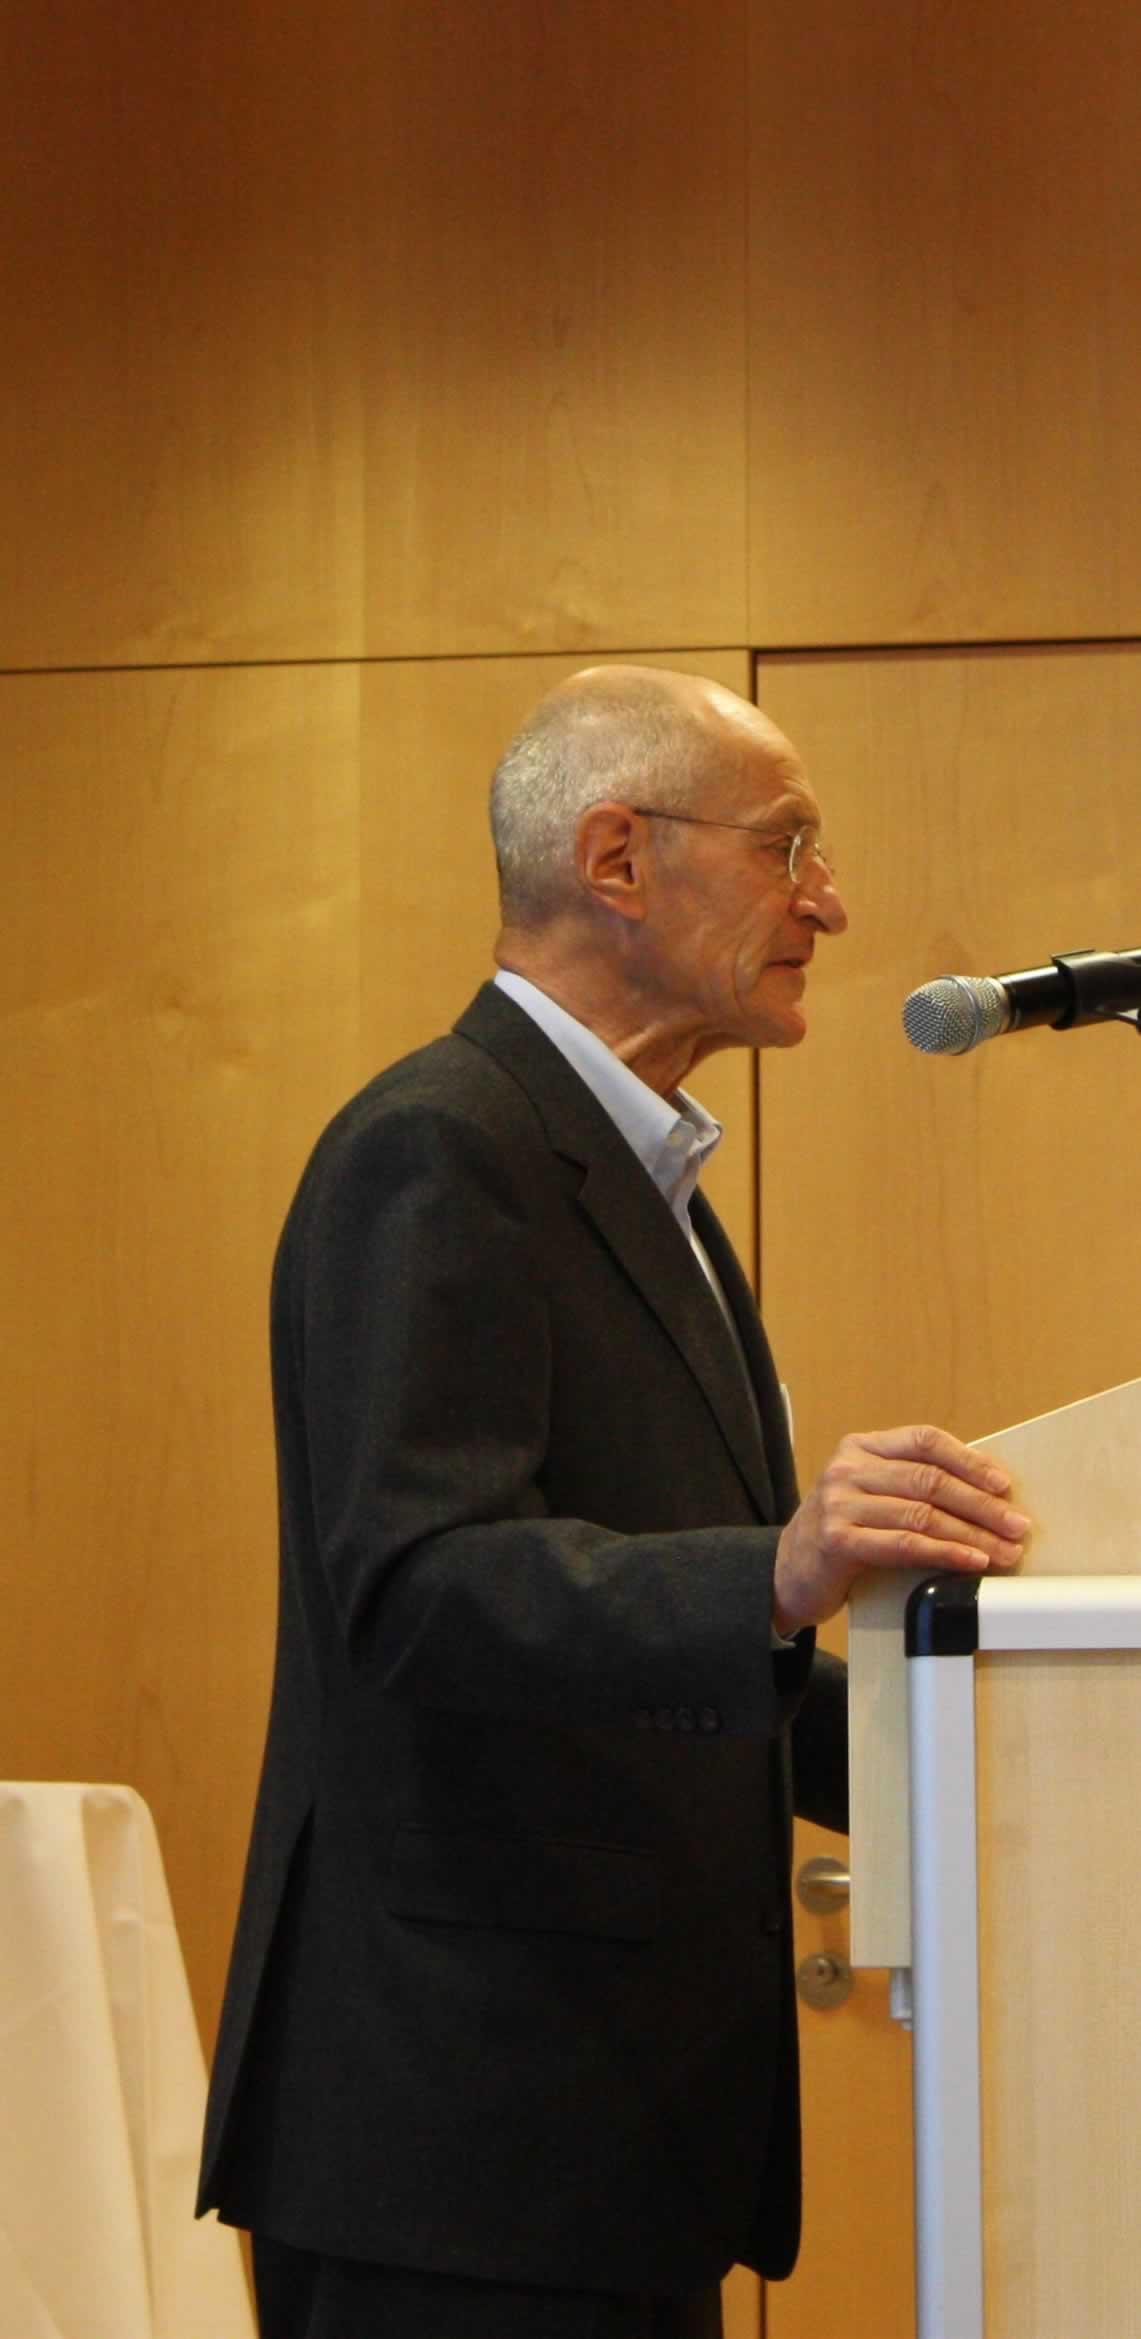 Begrüssung durch Vereinspräsident Peter Grütter